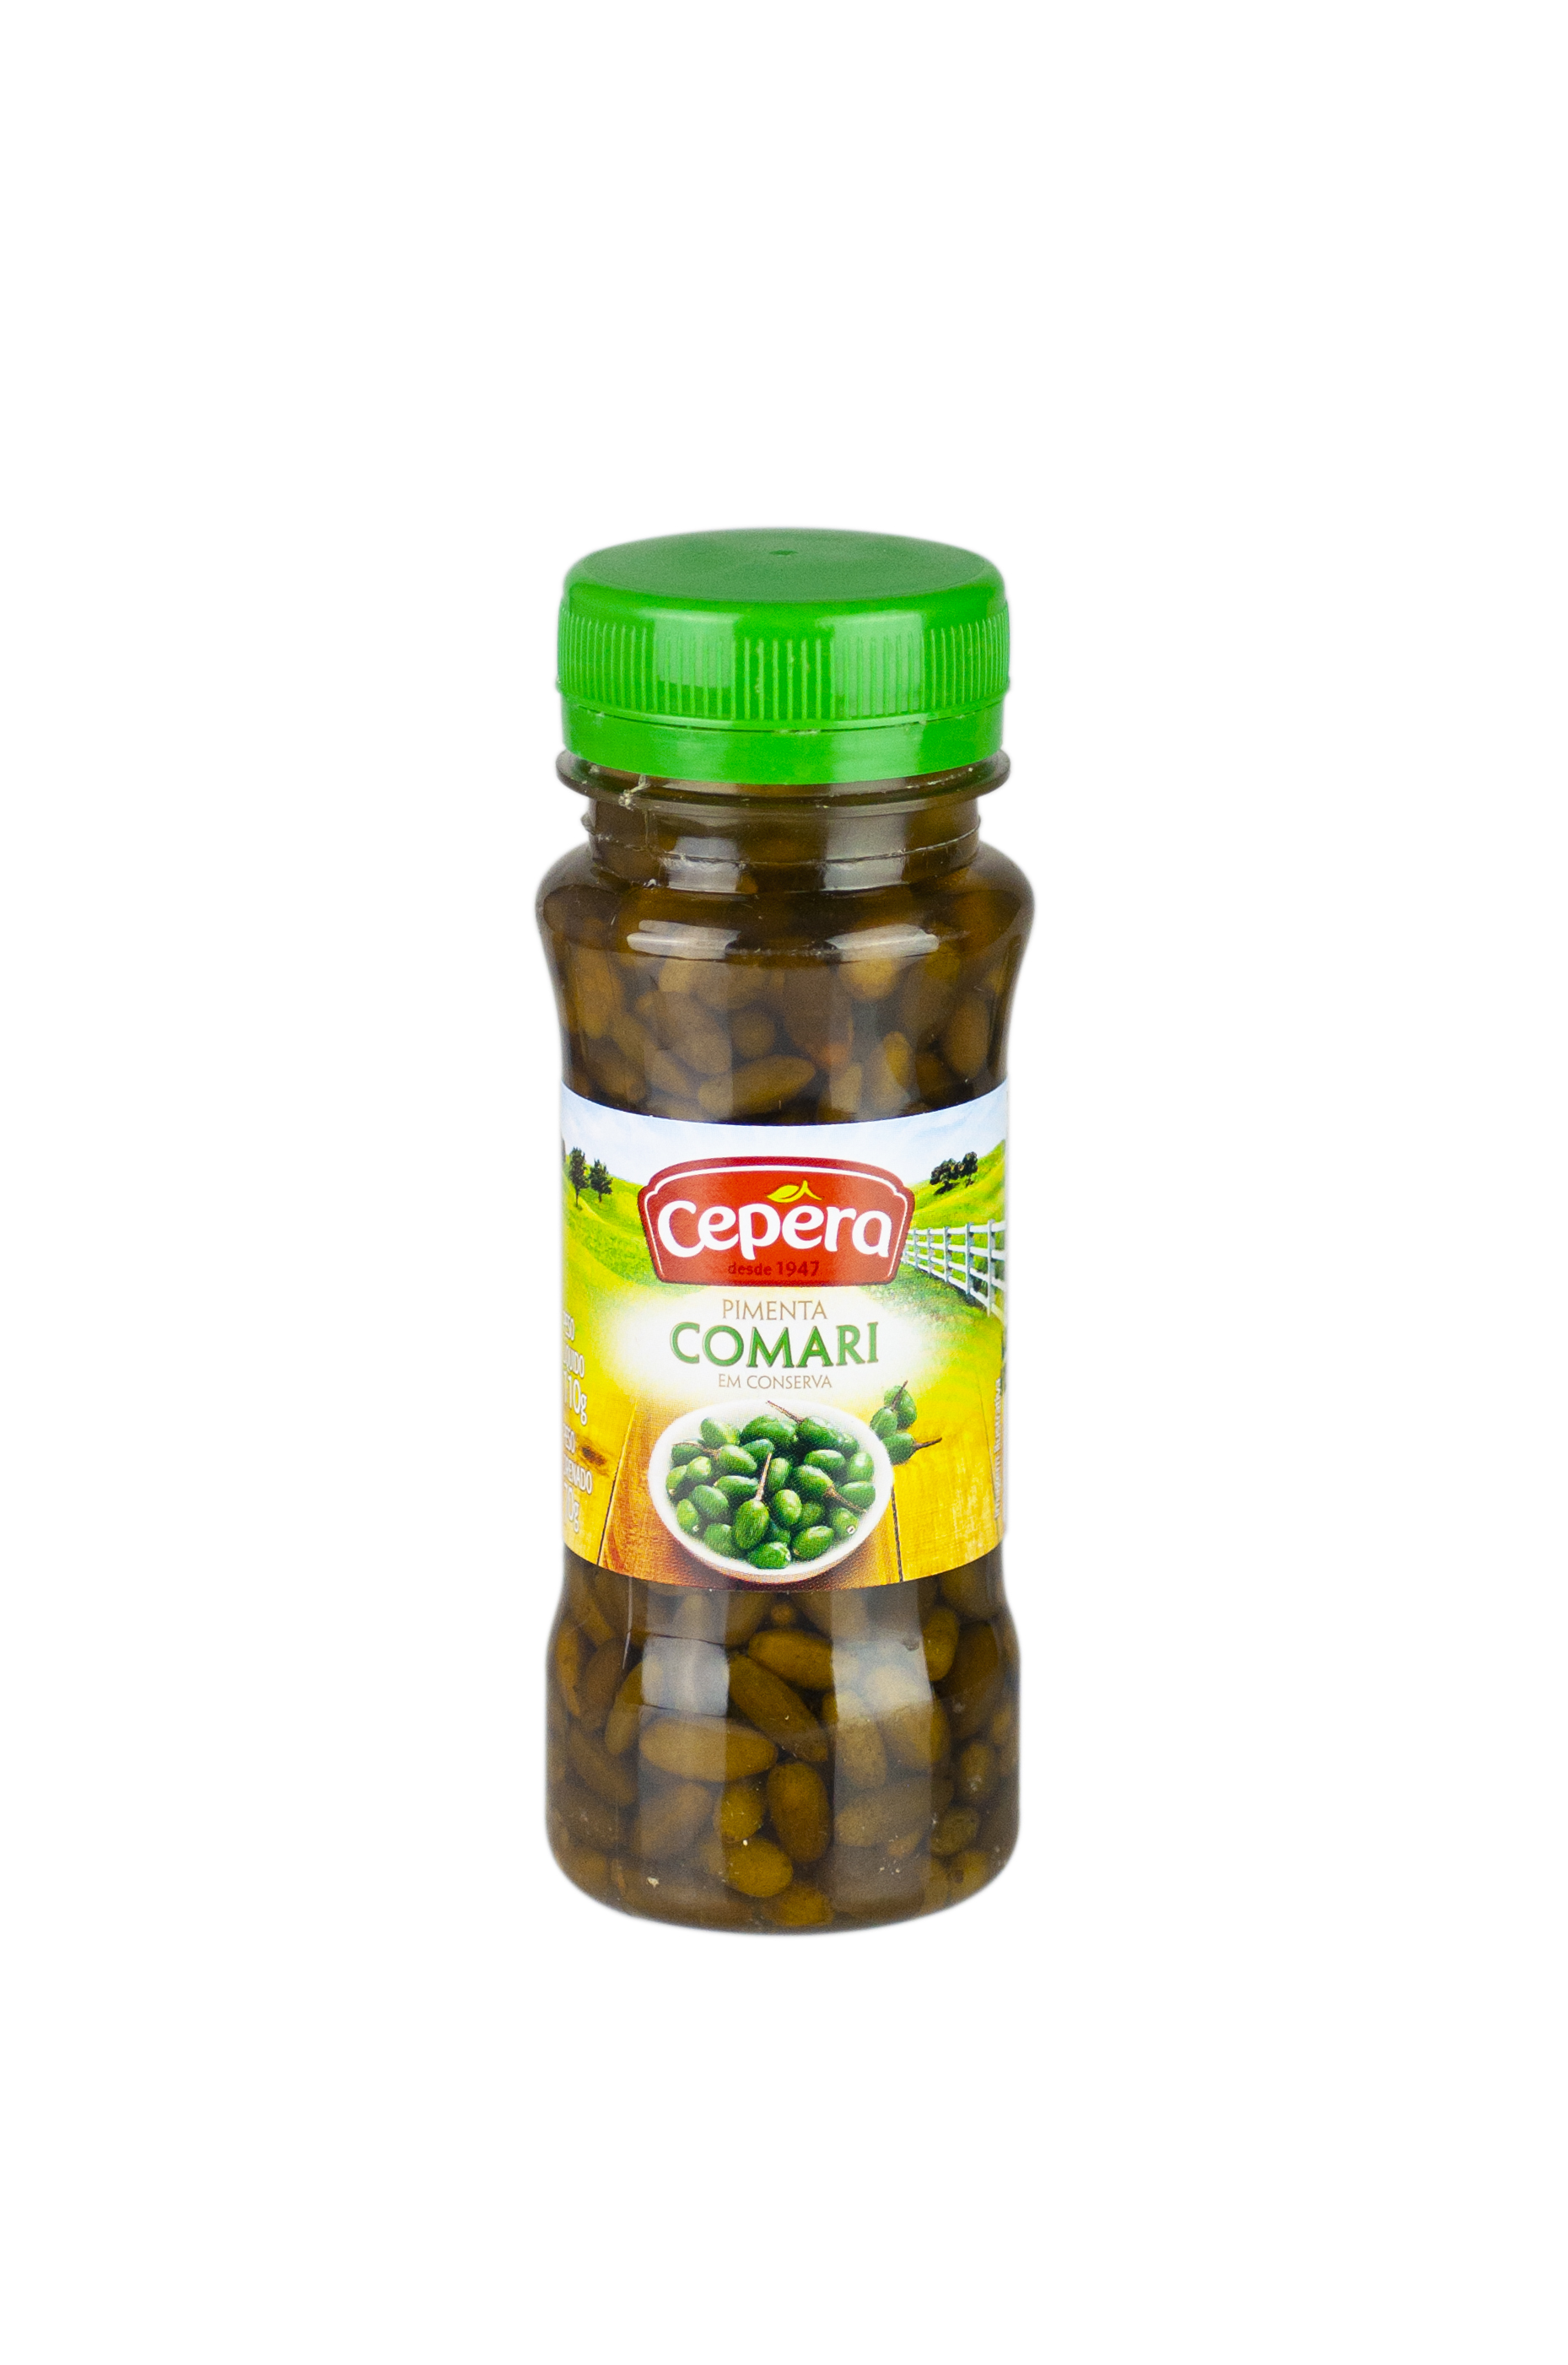 Pimenta Comari Verde Cepera Brasilien